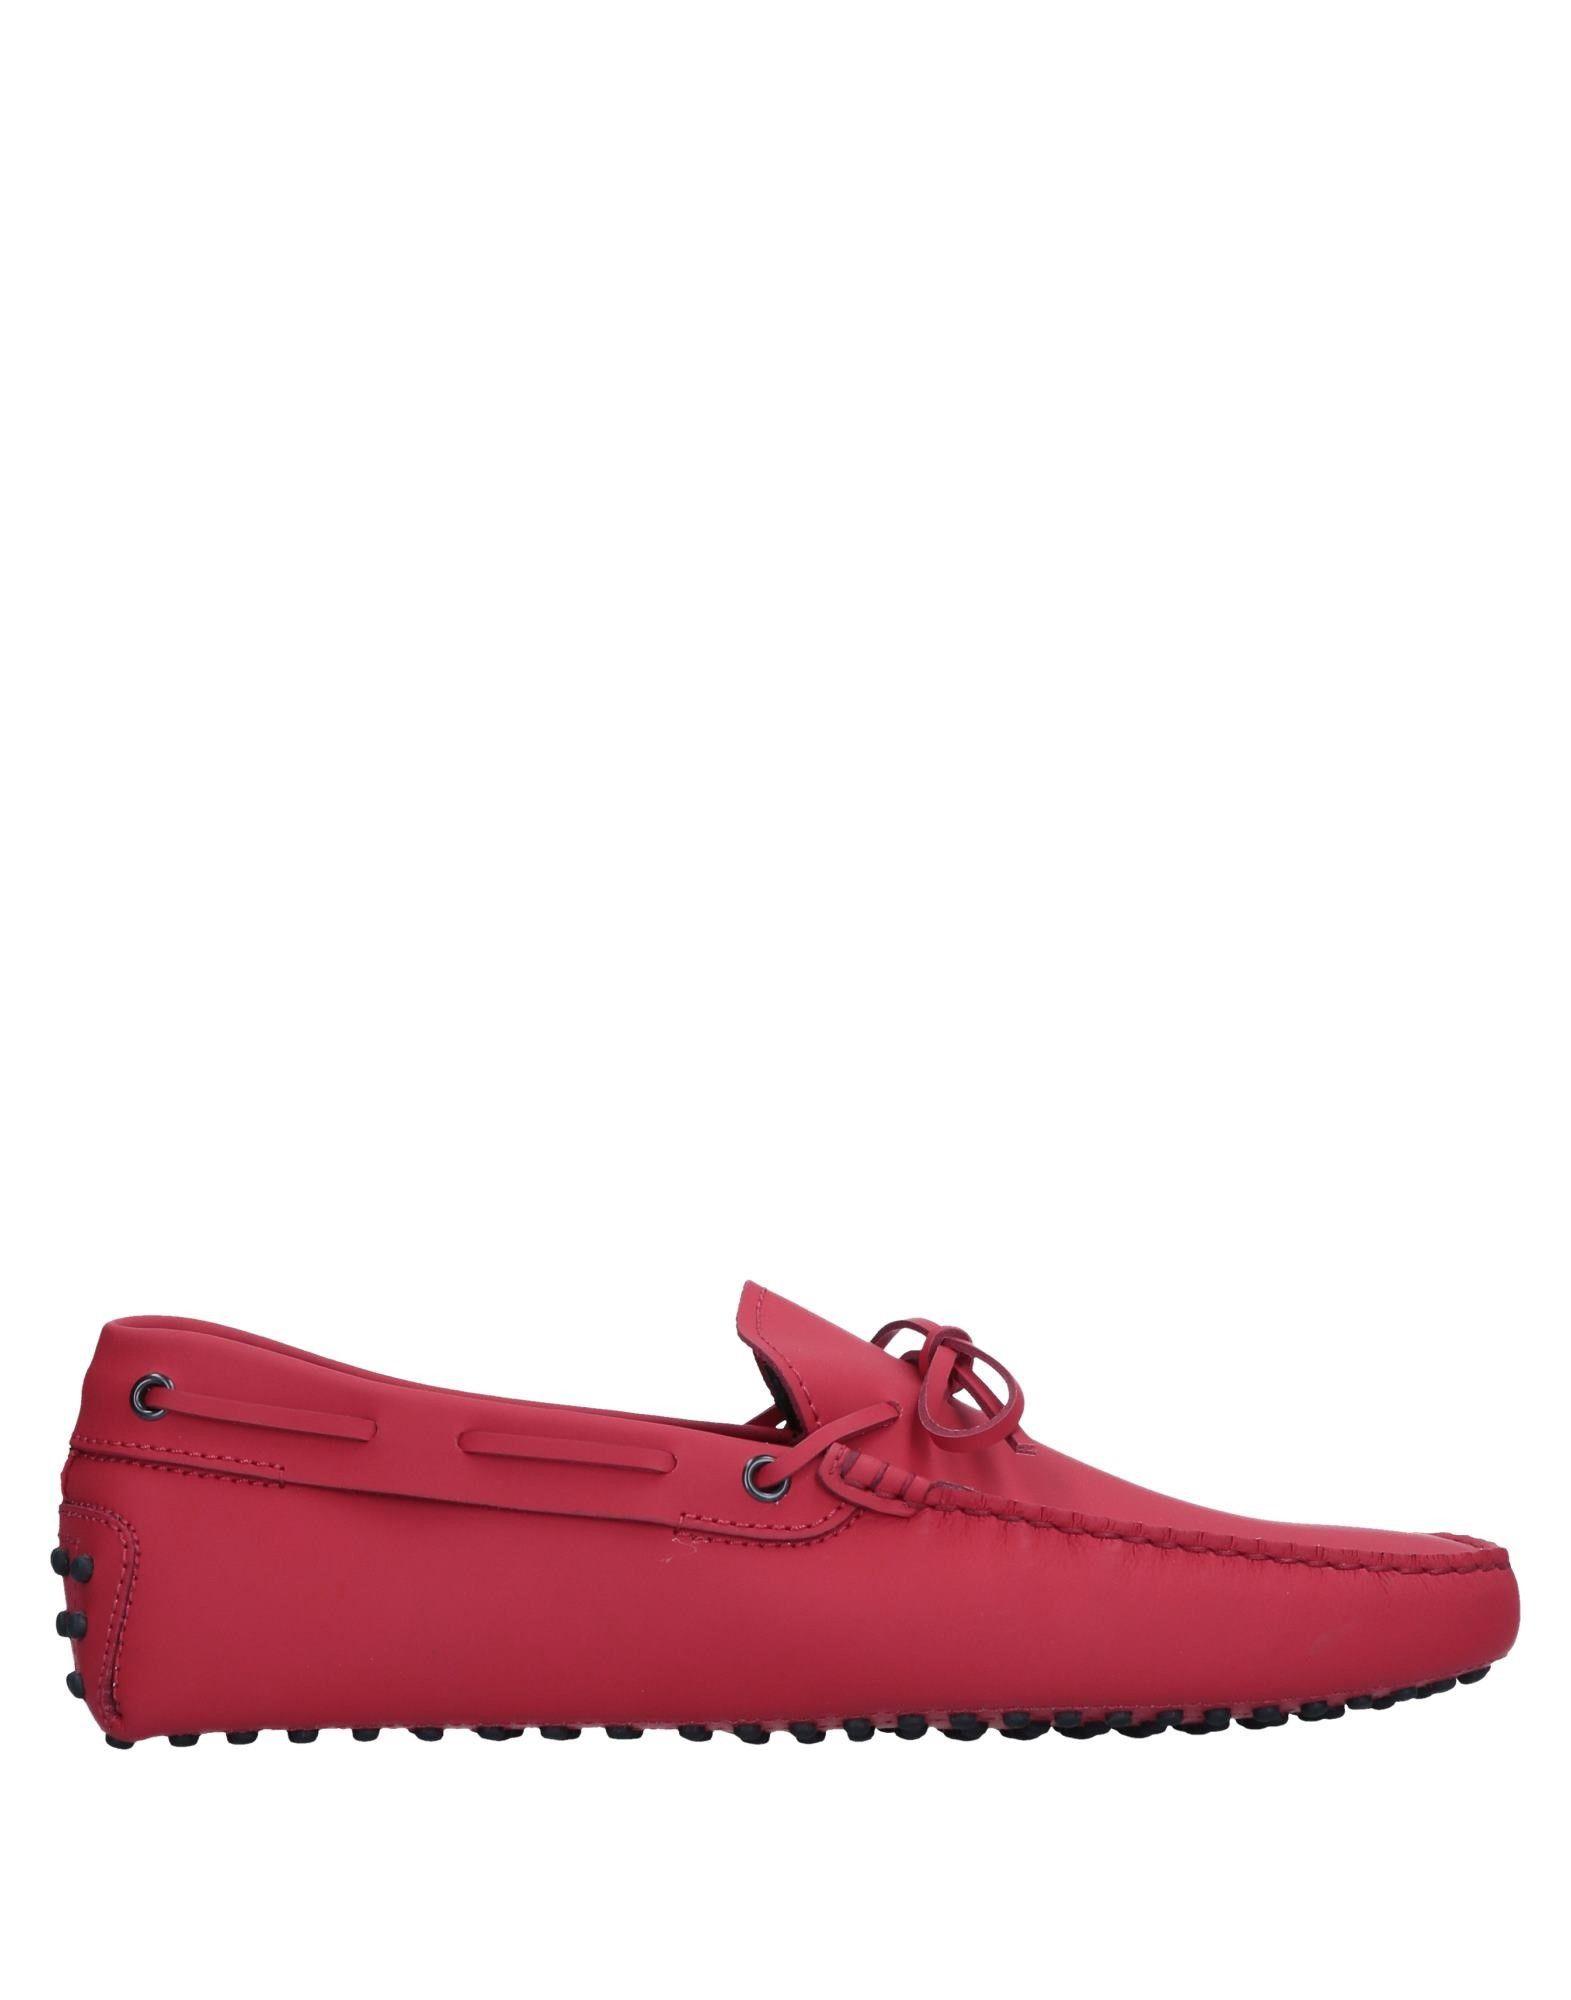 Tod's Gute Mokassins Herren  11548646LX Gute Tod's Qualität beliebte Schuhe 459023